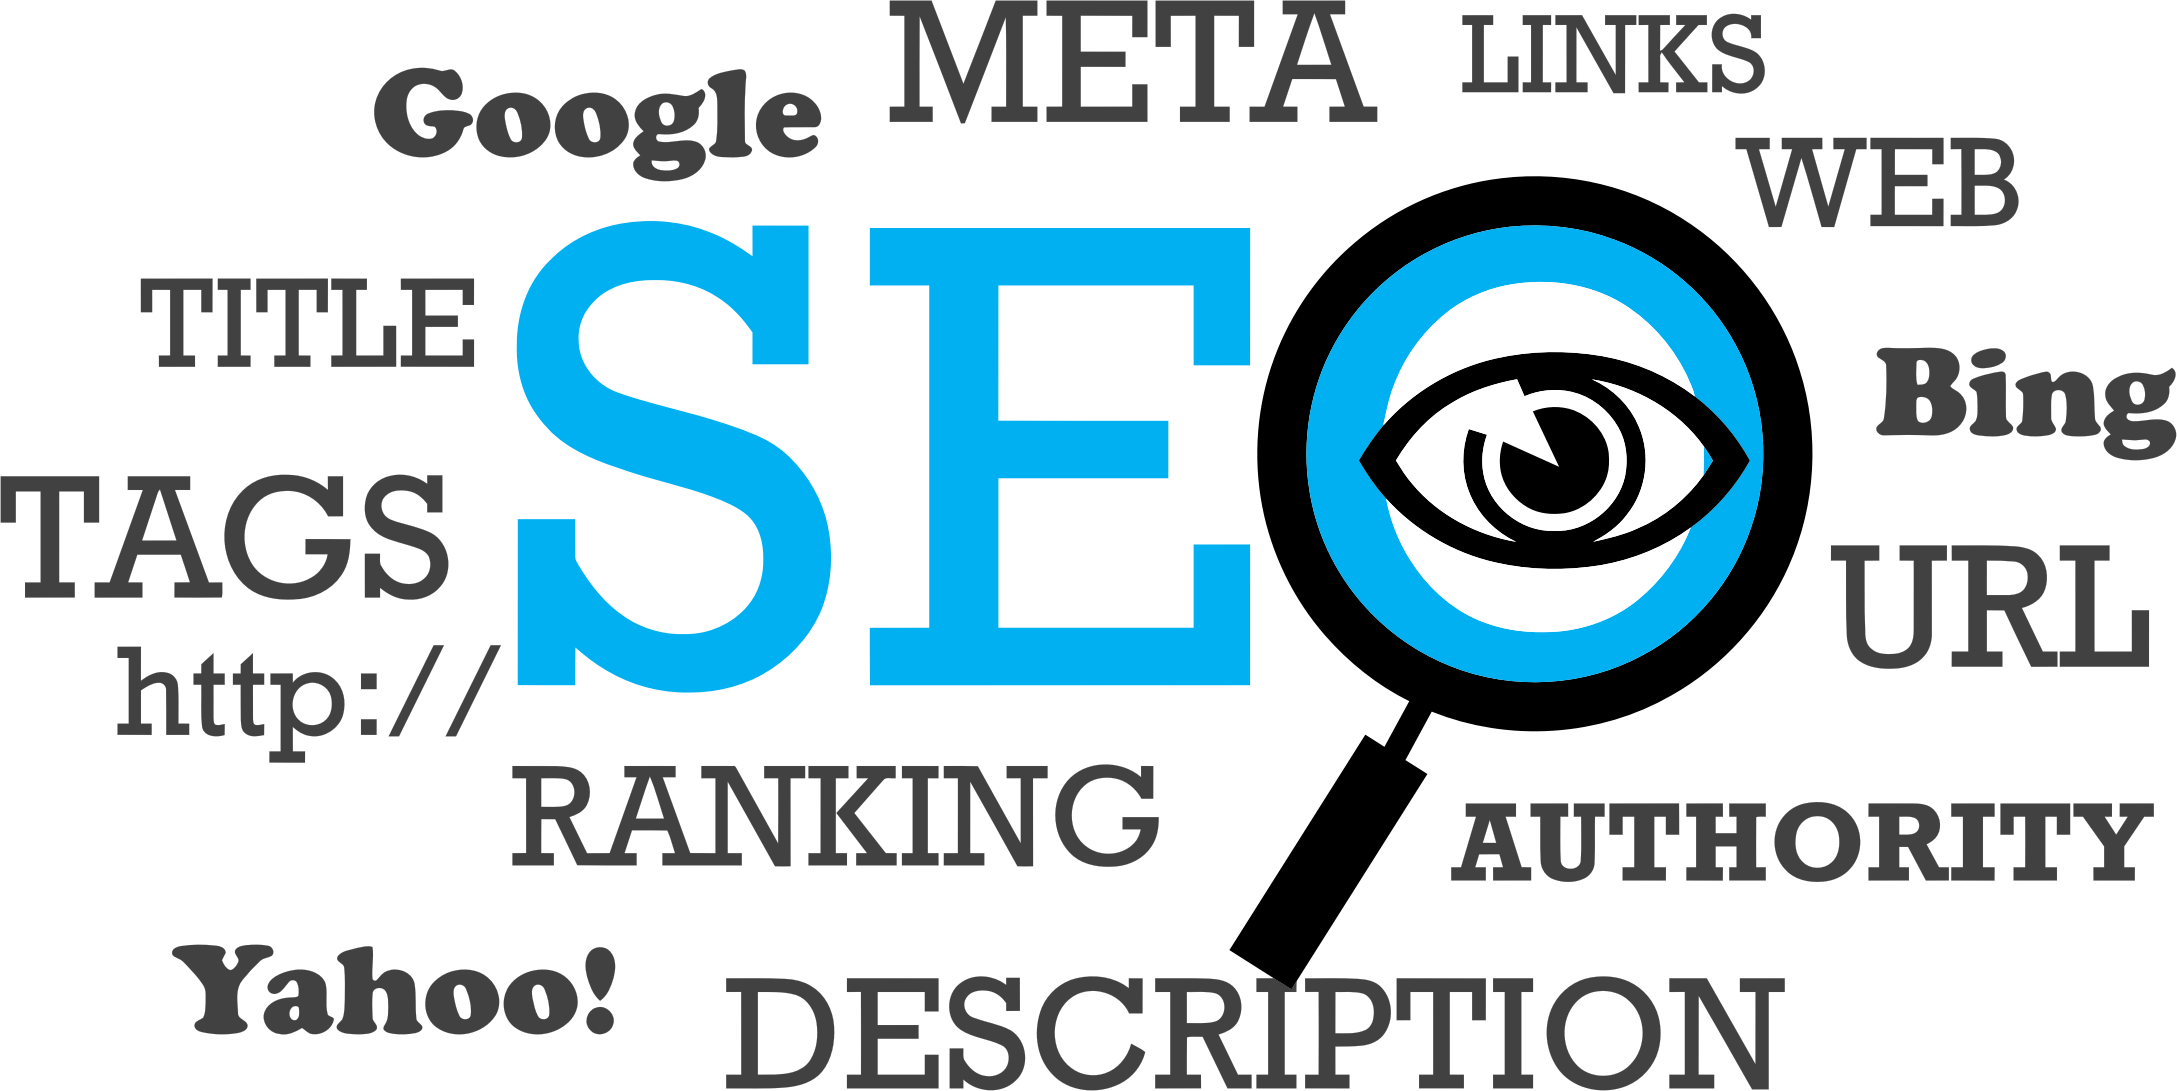 Internet clipart url. Search engine optimization tips